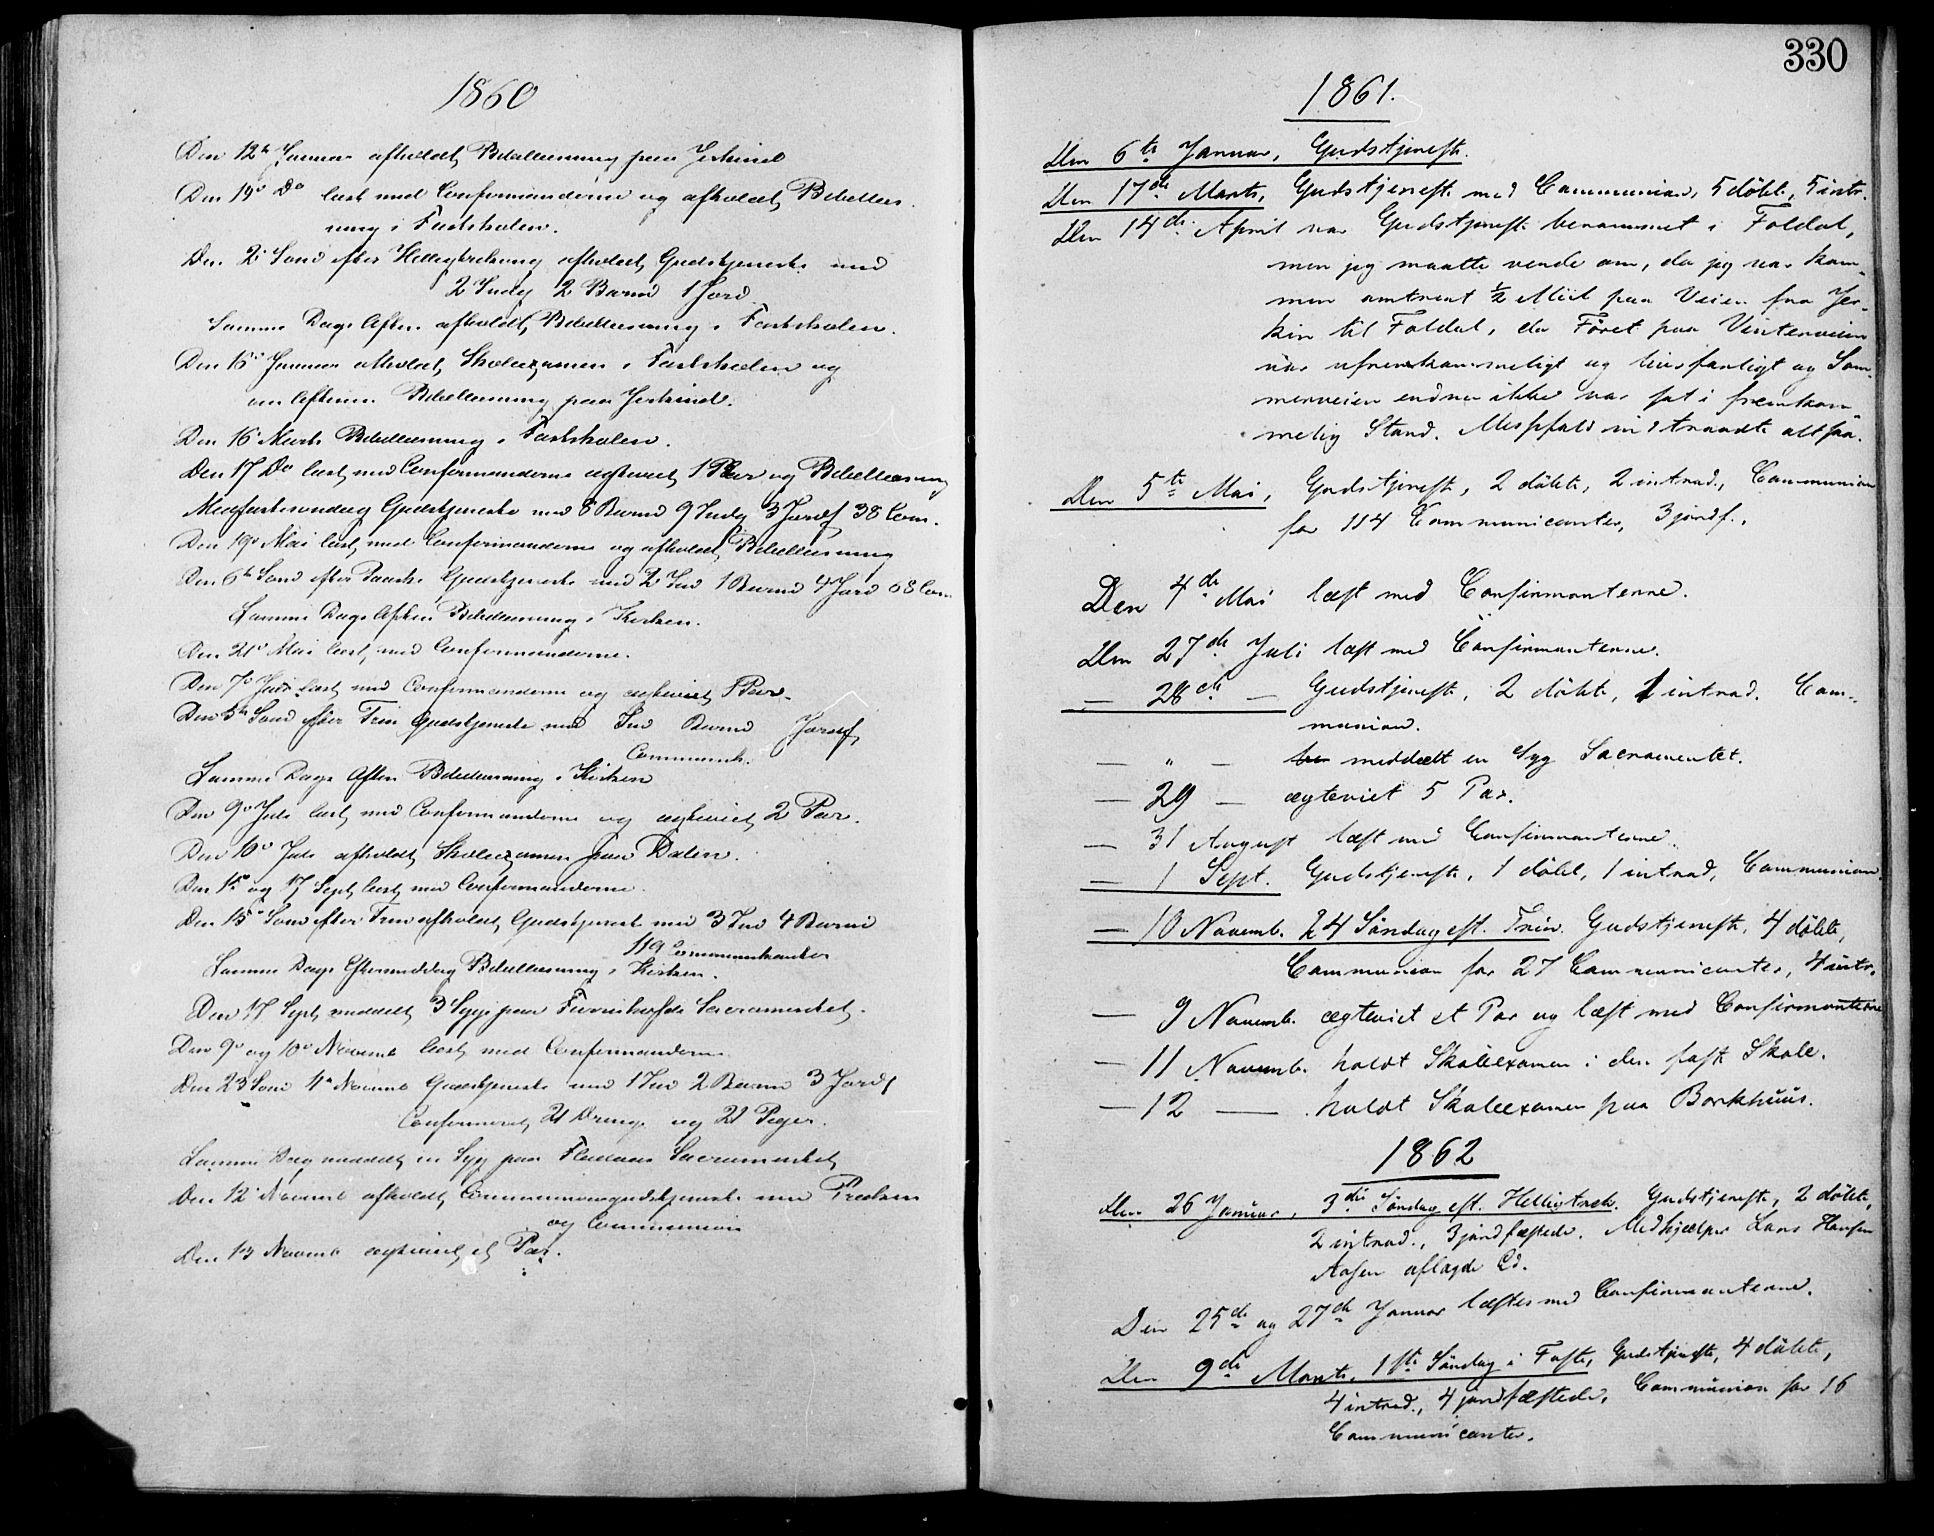 SAH, Lesja prestekontor, Ministerialbok nr. 7, 1854-1862, s. 330